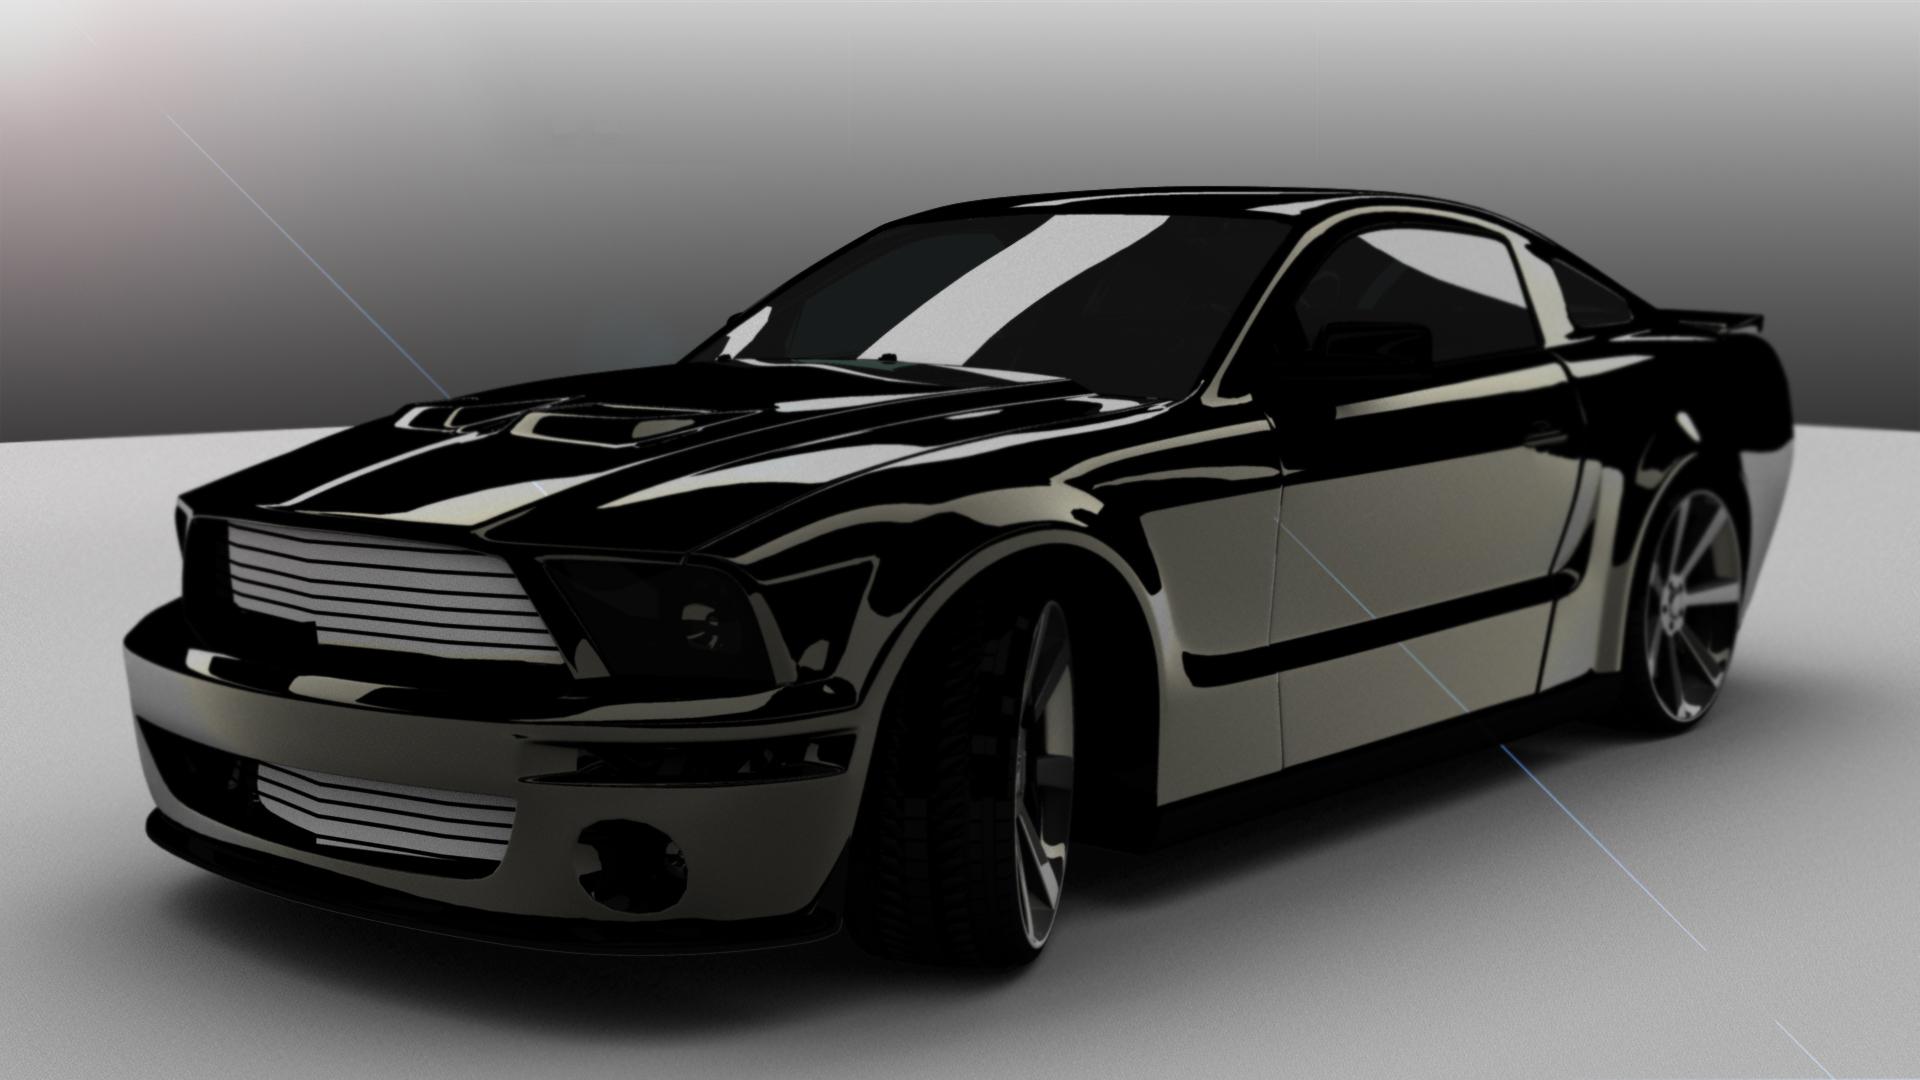 Black Luxury Vehicles: Black Hot Cars Wallpaper 30 Background